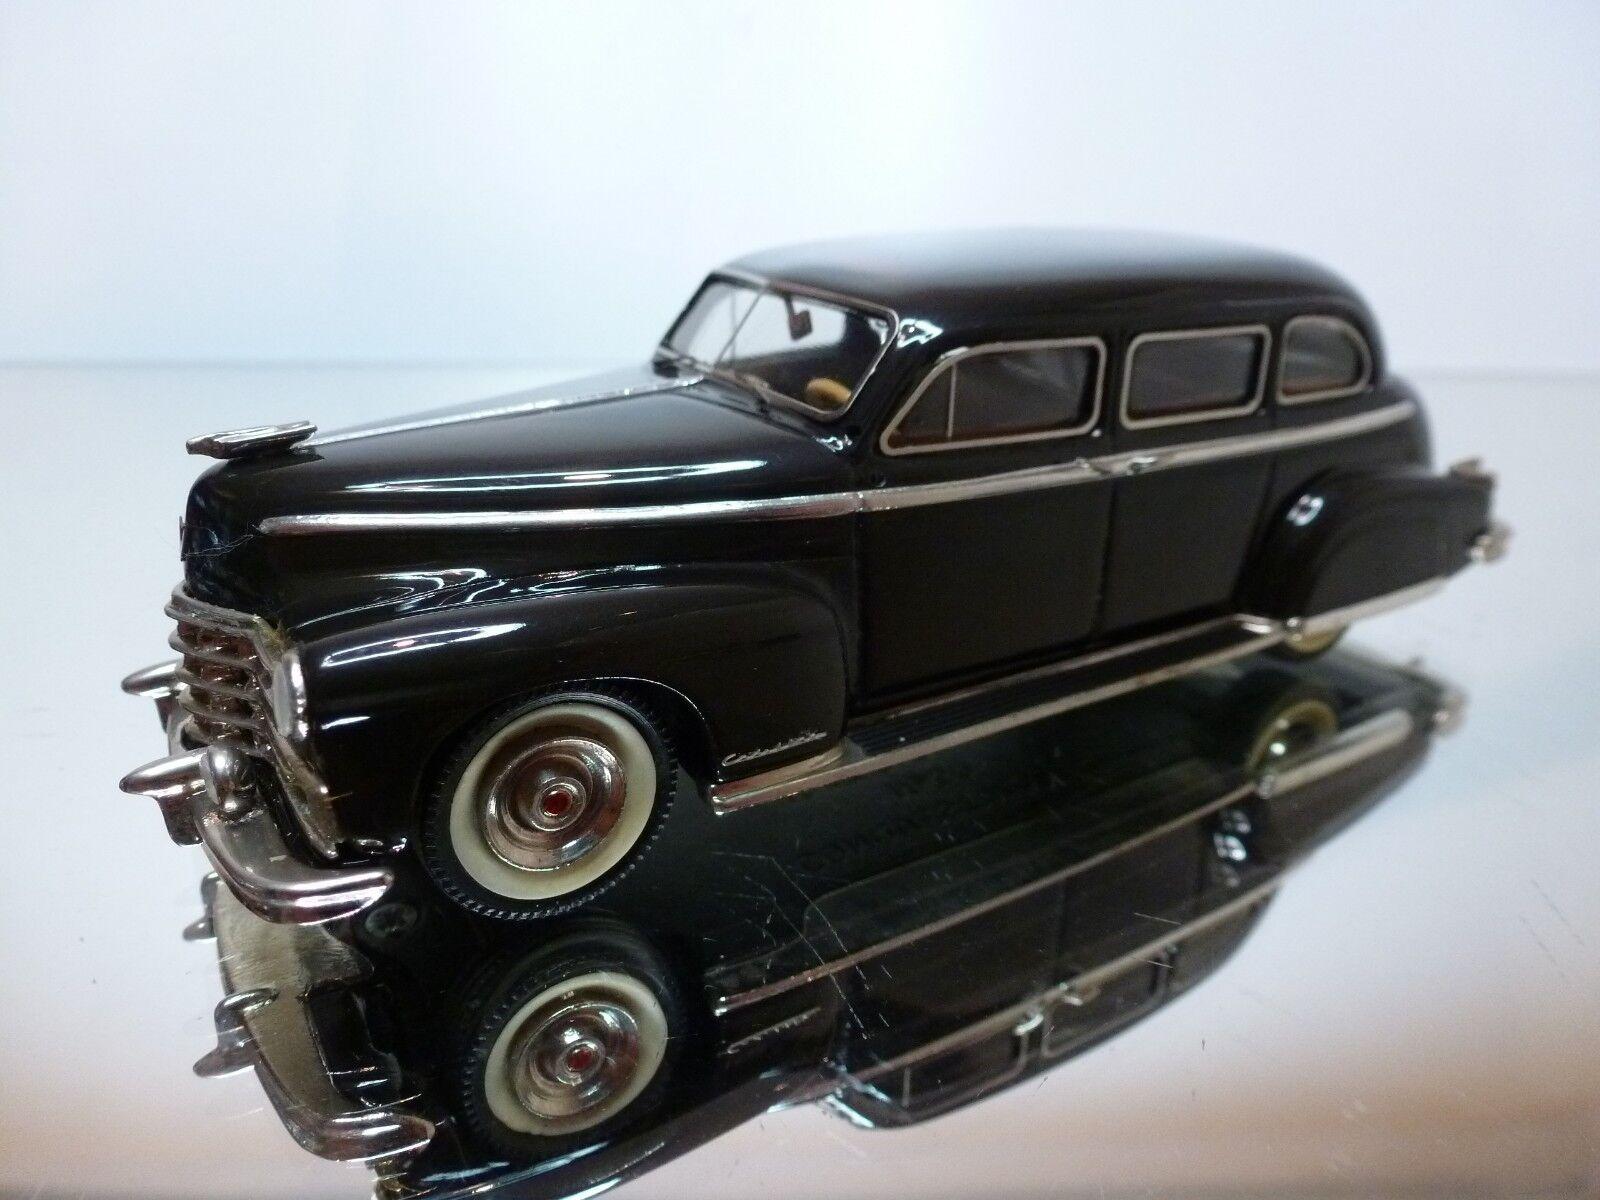 CONQUEST MODELS 1947 CADILLAC FLEETWOOD 75 - grigio nero 1 43 - EXCELLENT - 6